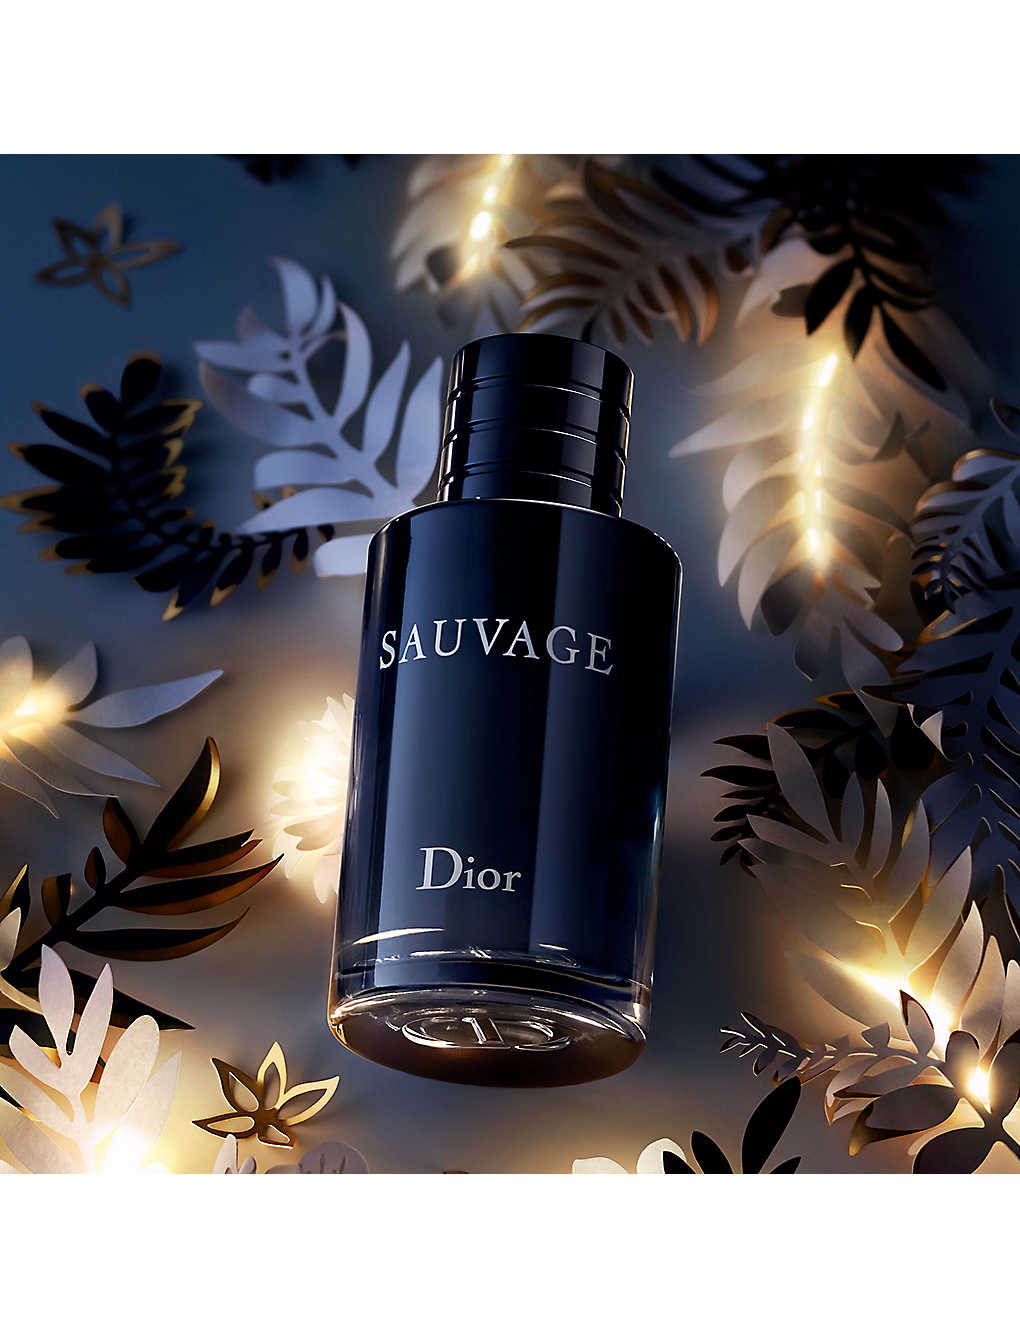 Dior Limited Edition Dior Sauvage Eau de Toilette